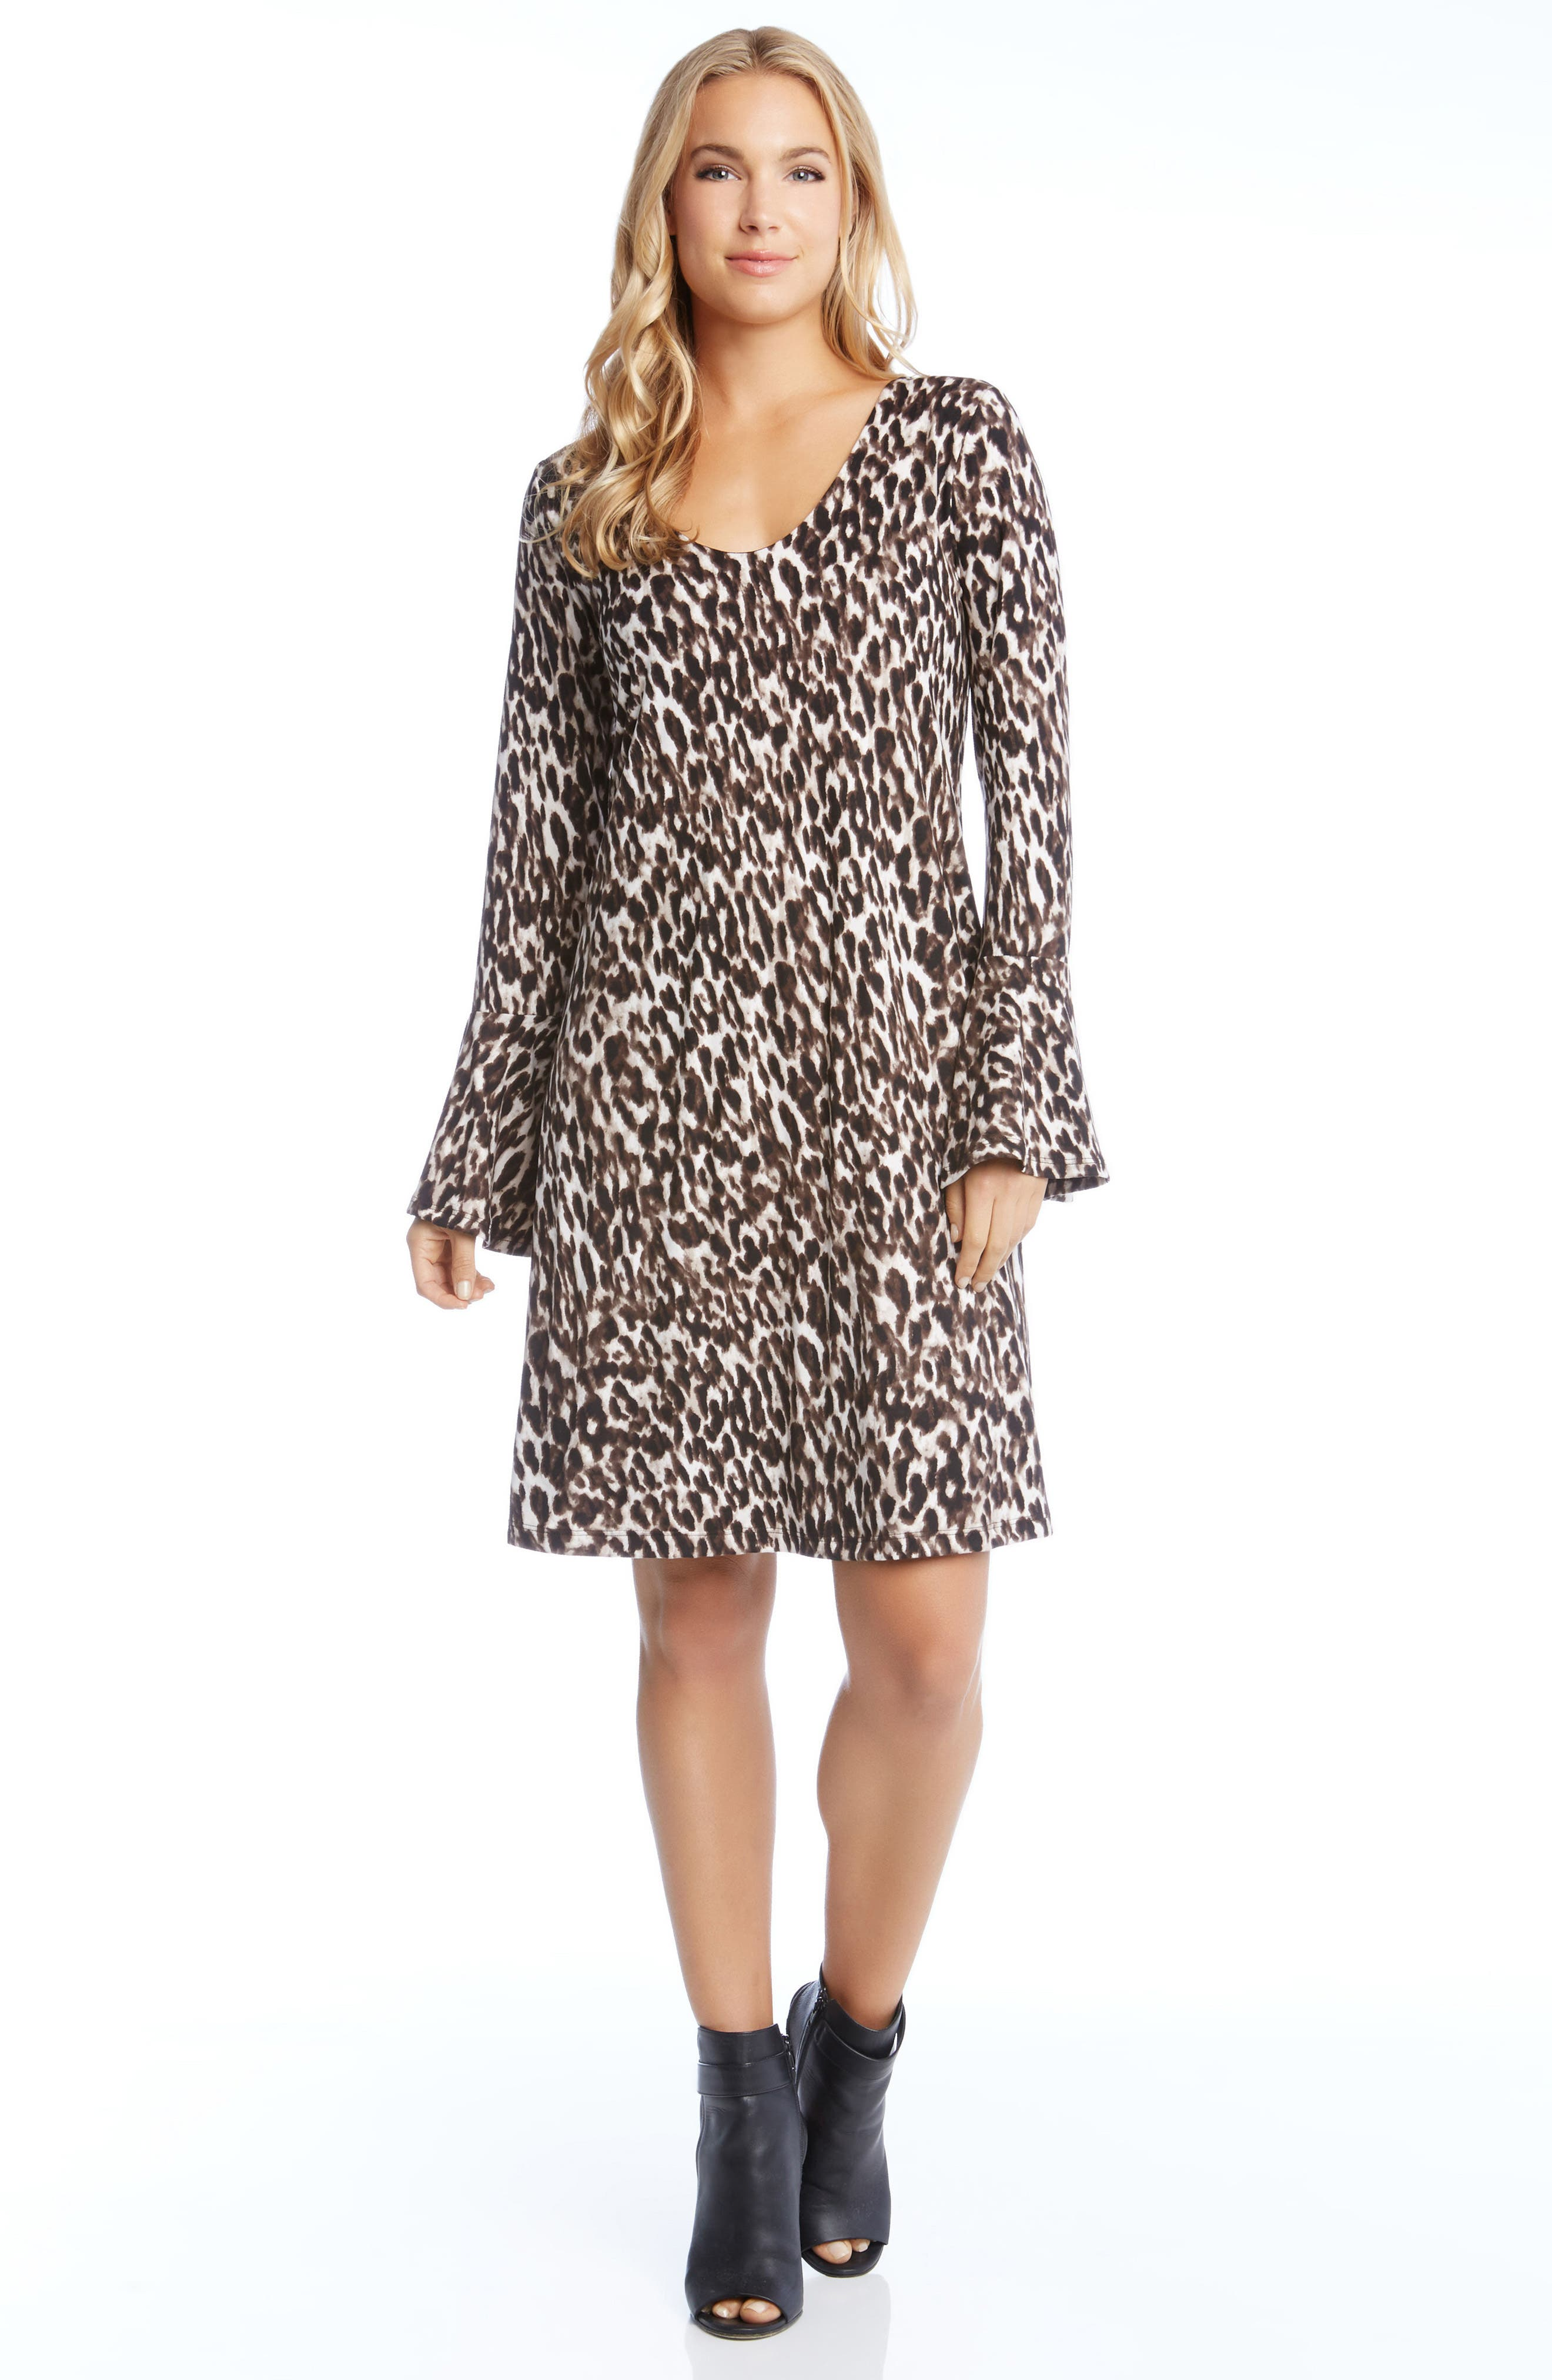 Bell Sleeve Brushed Knit Dress,                             Alternate thumbnail 3, color,                             Leopard